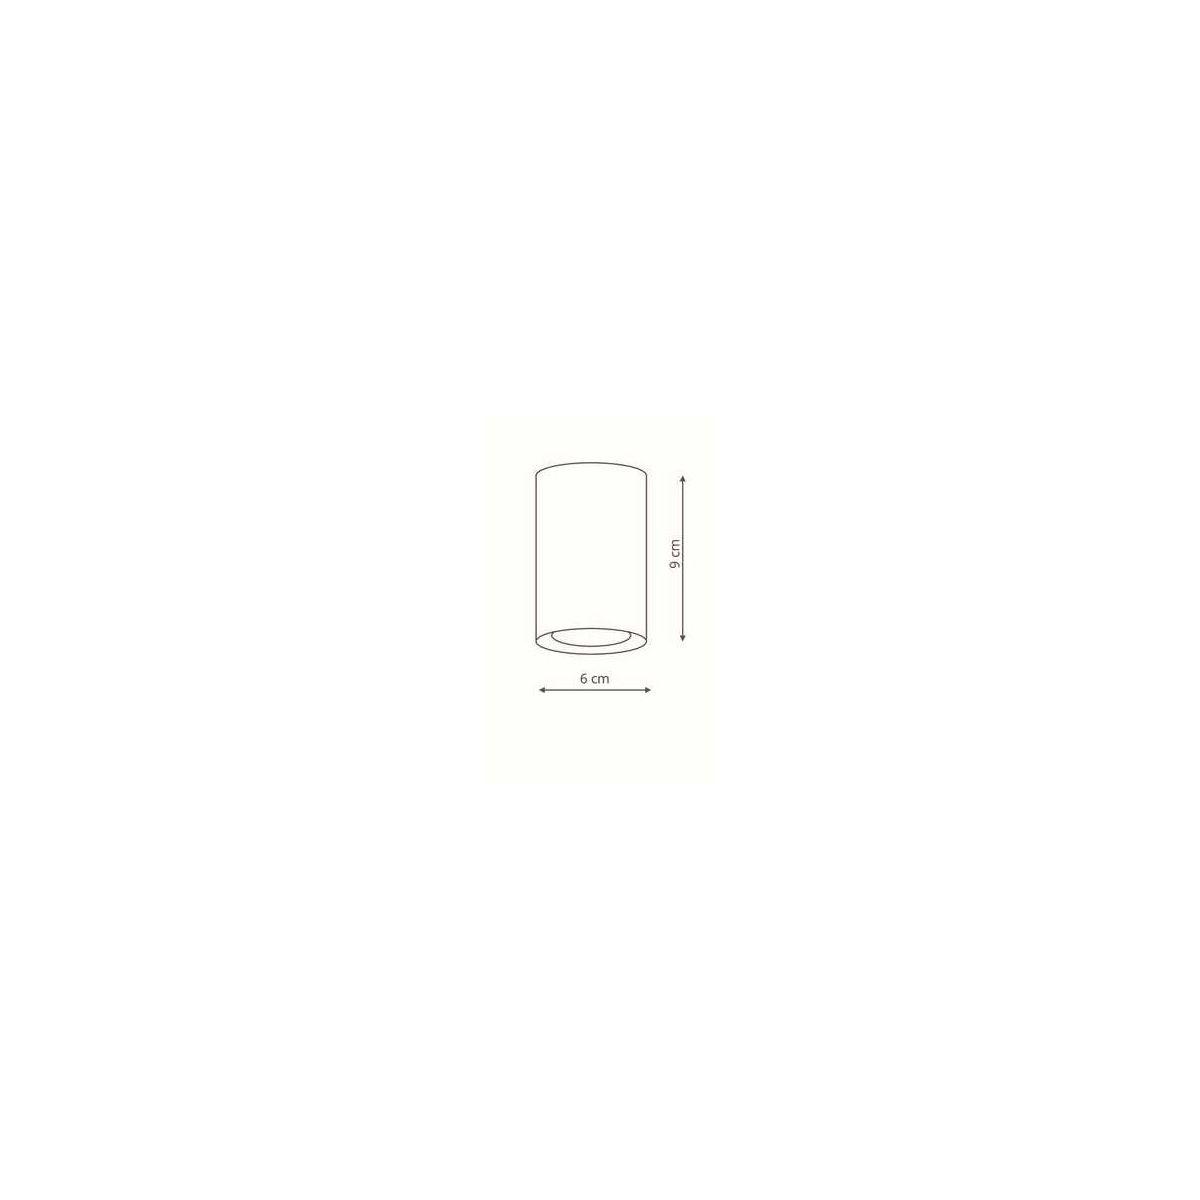 Downlight MANACOR 9 GU10 - złoty ring